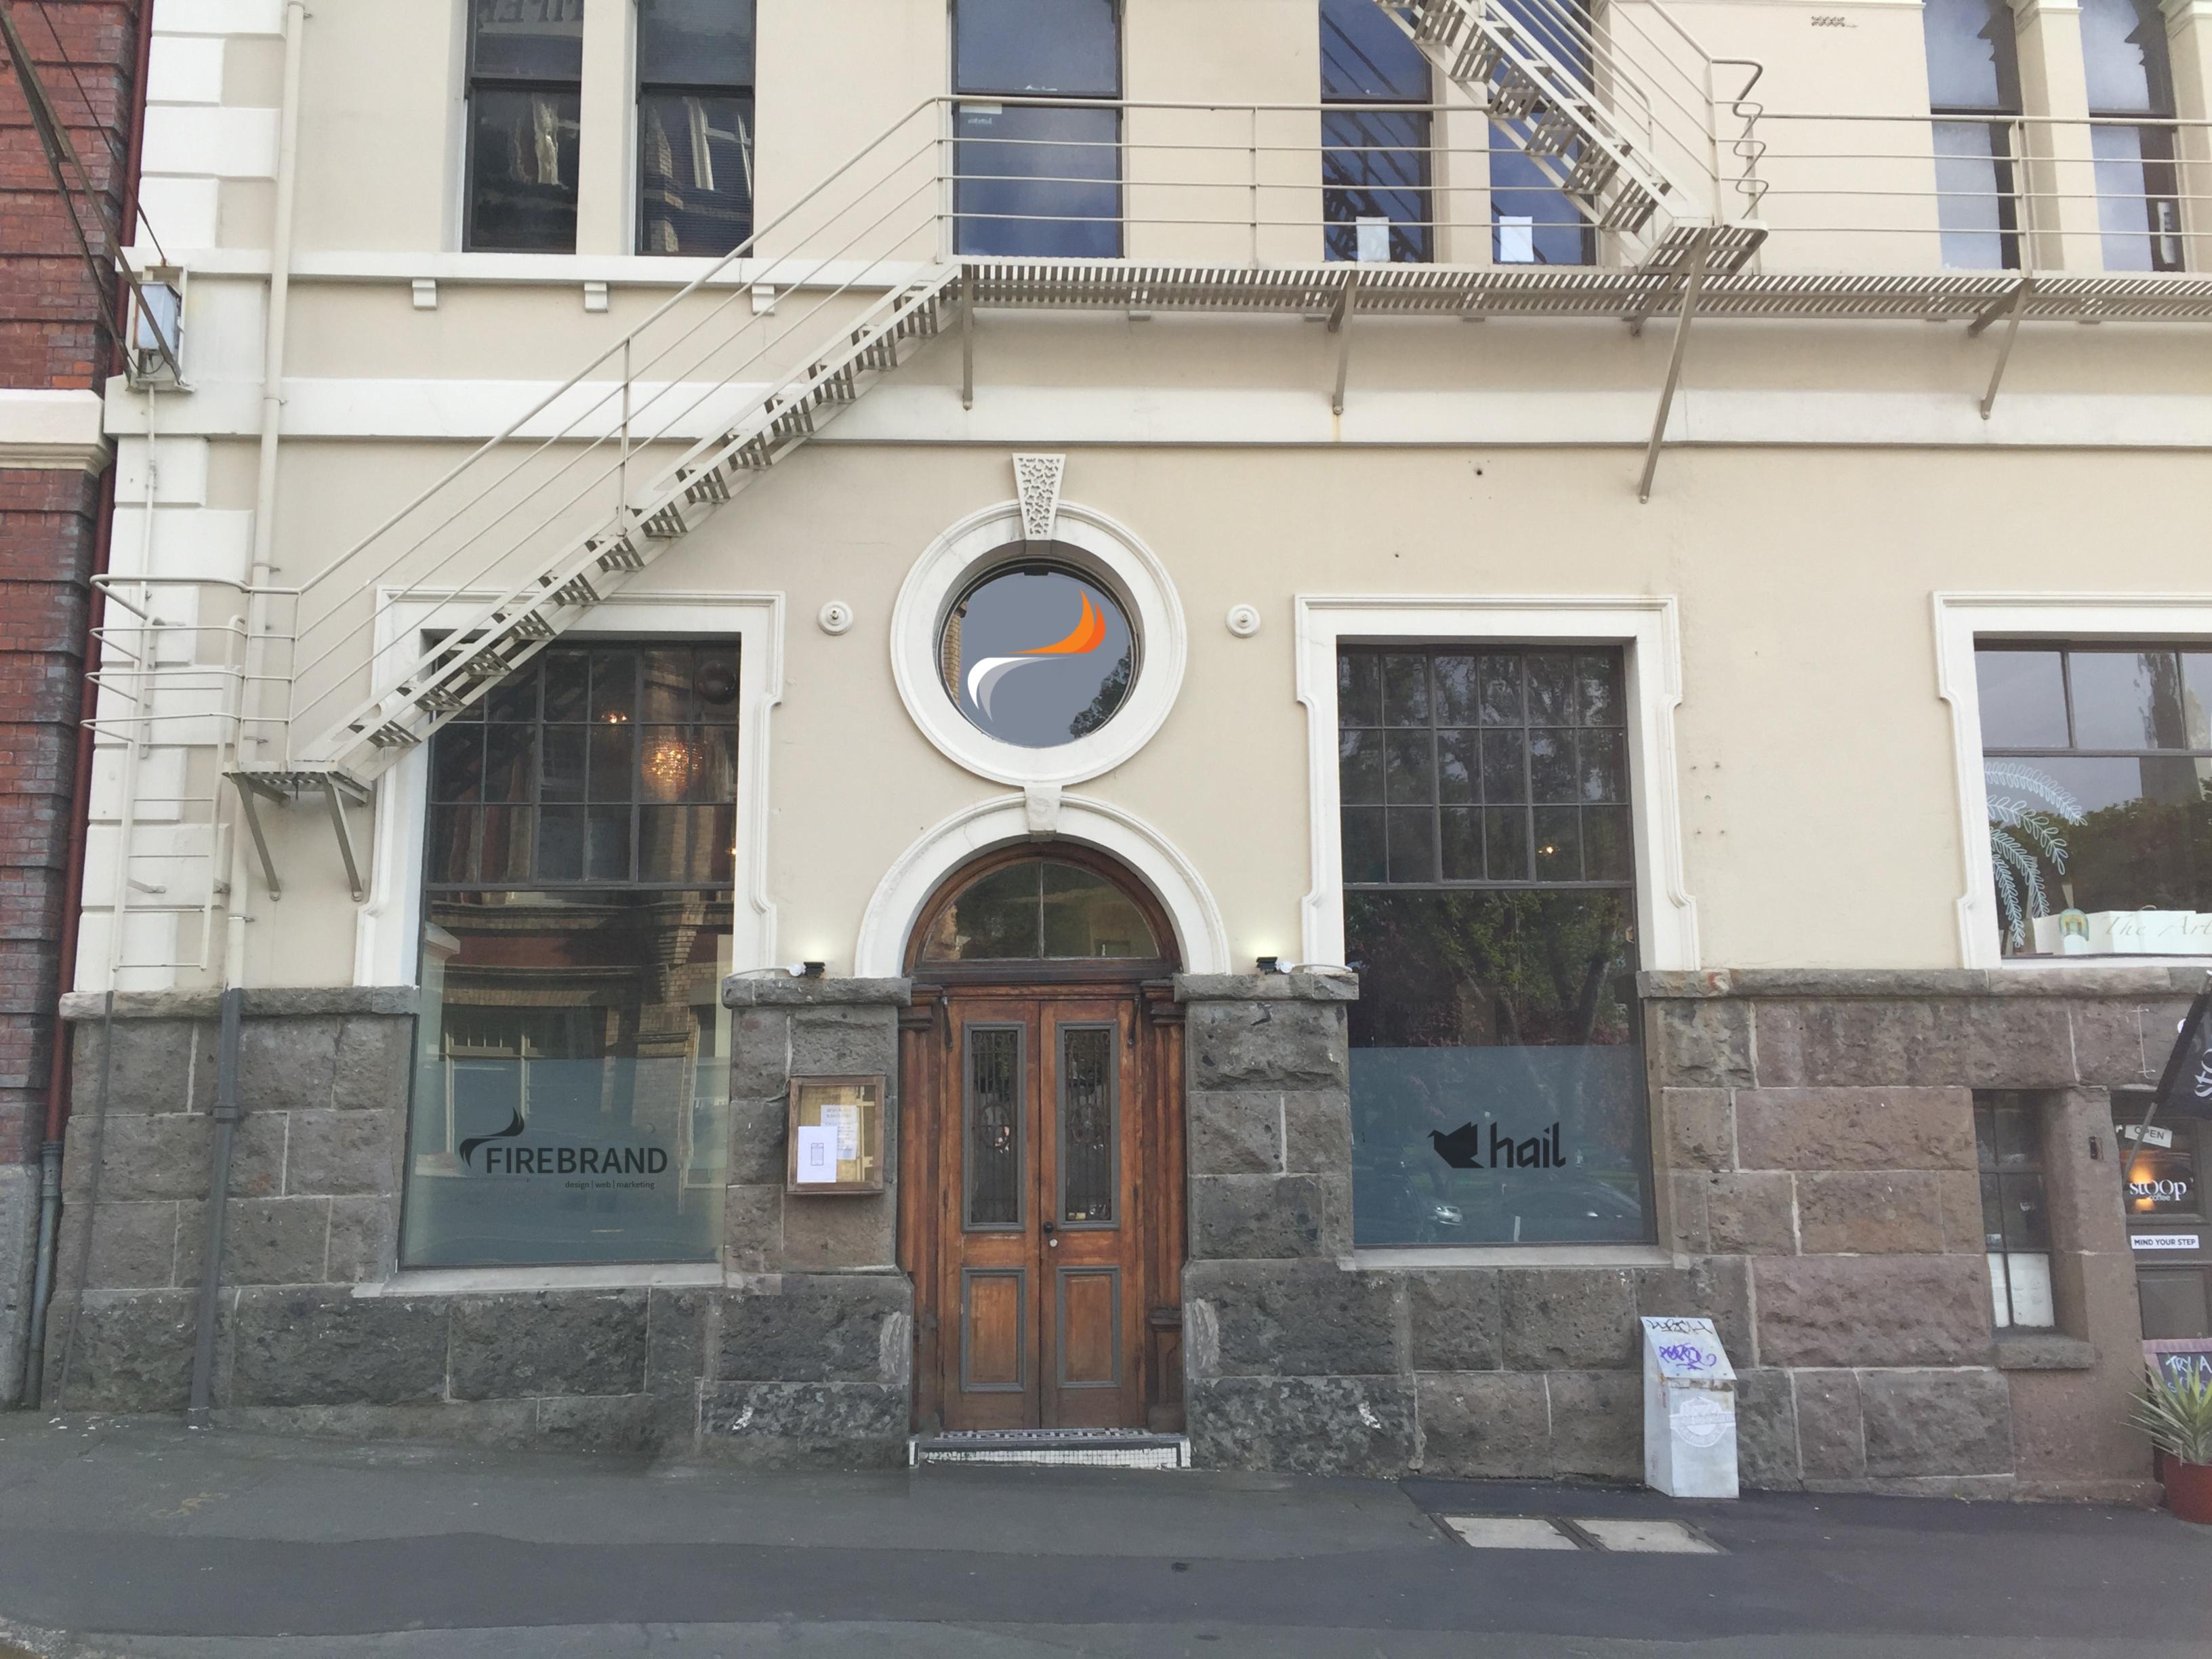 2 Dowling Street, Dunedin. Home of Firebrand and Hail.